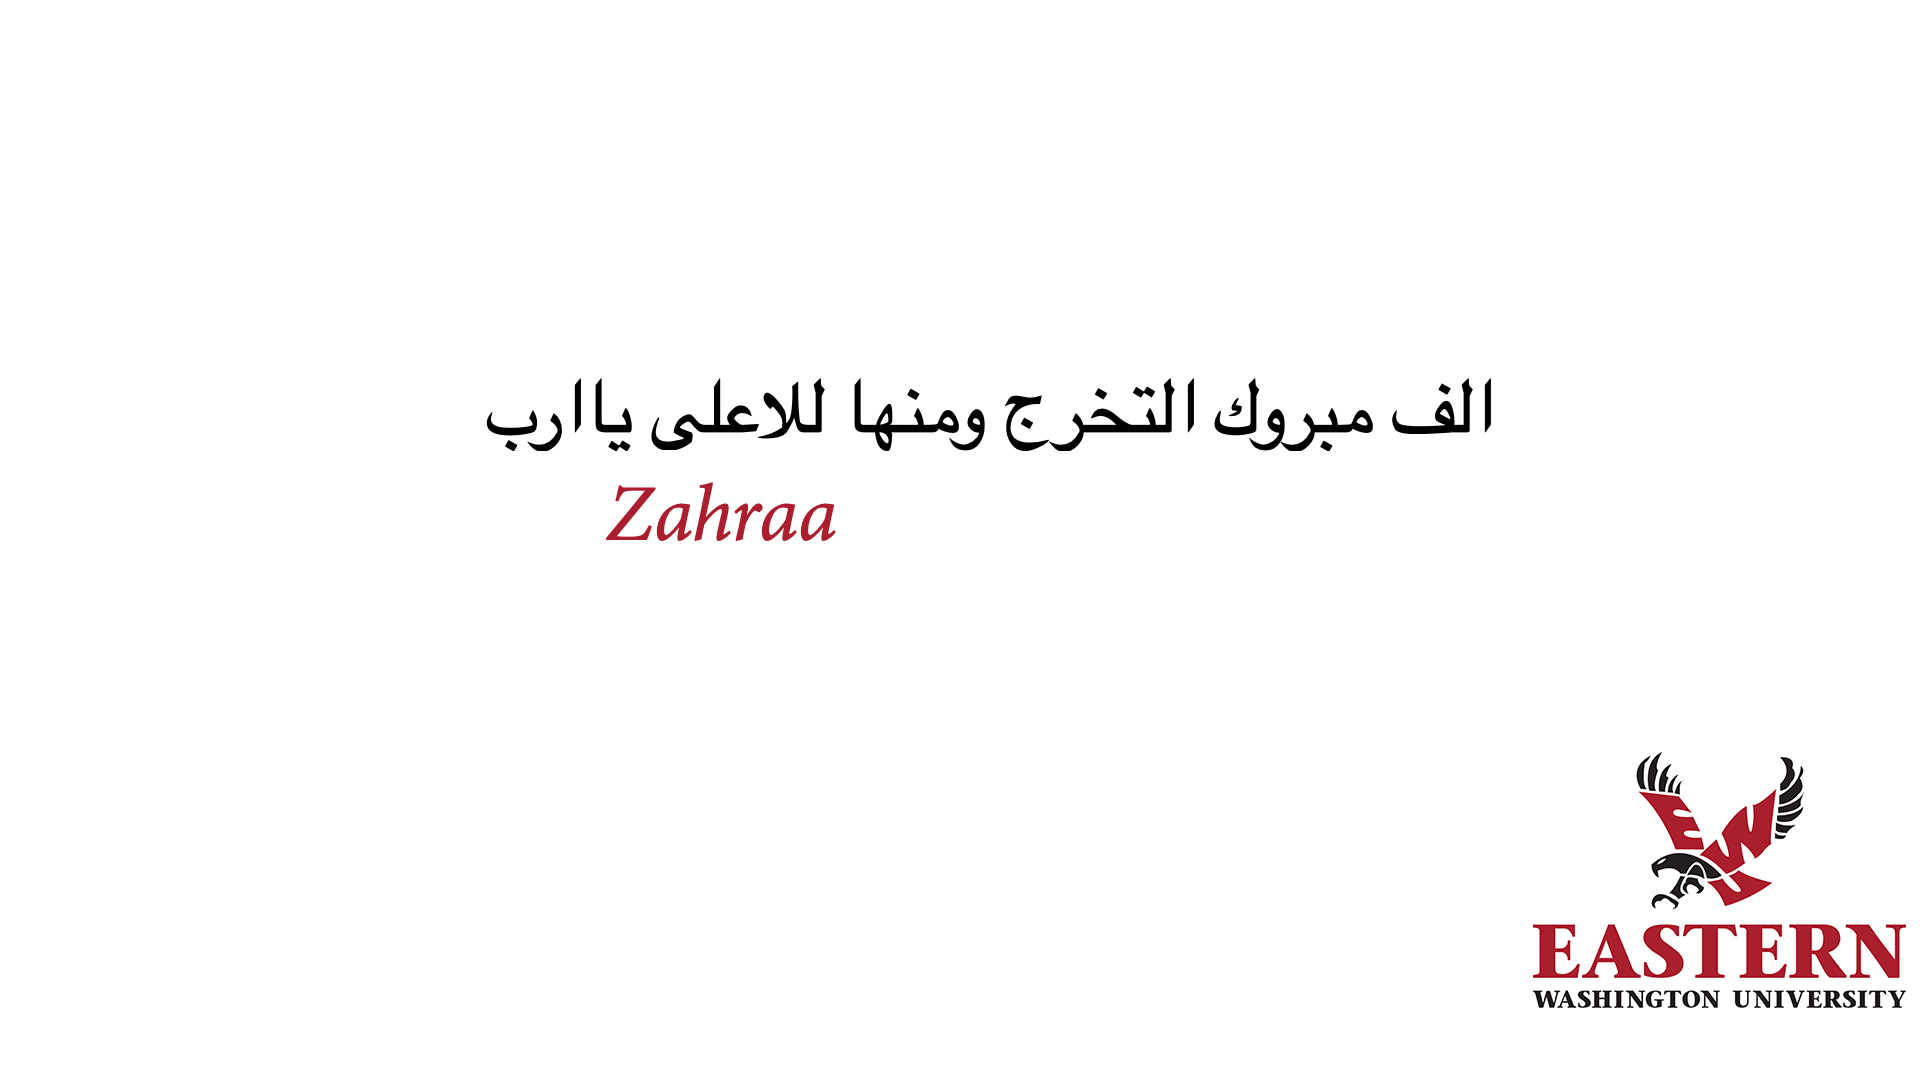 tbi_abdulhameed-al-rikabi_8582.png